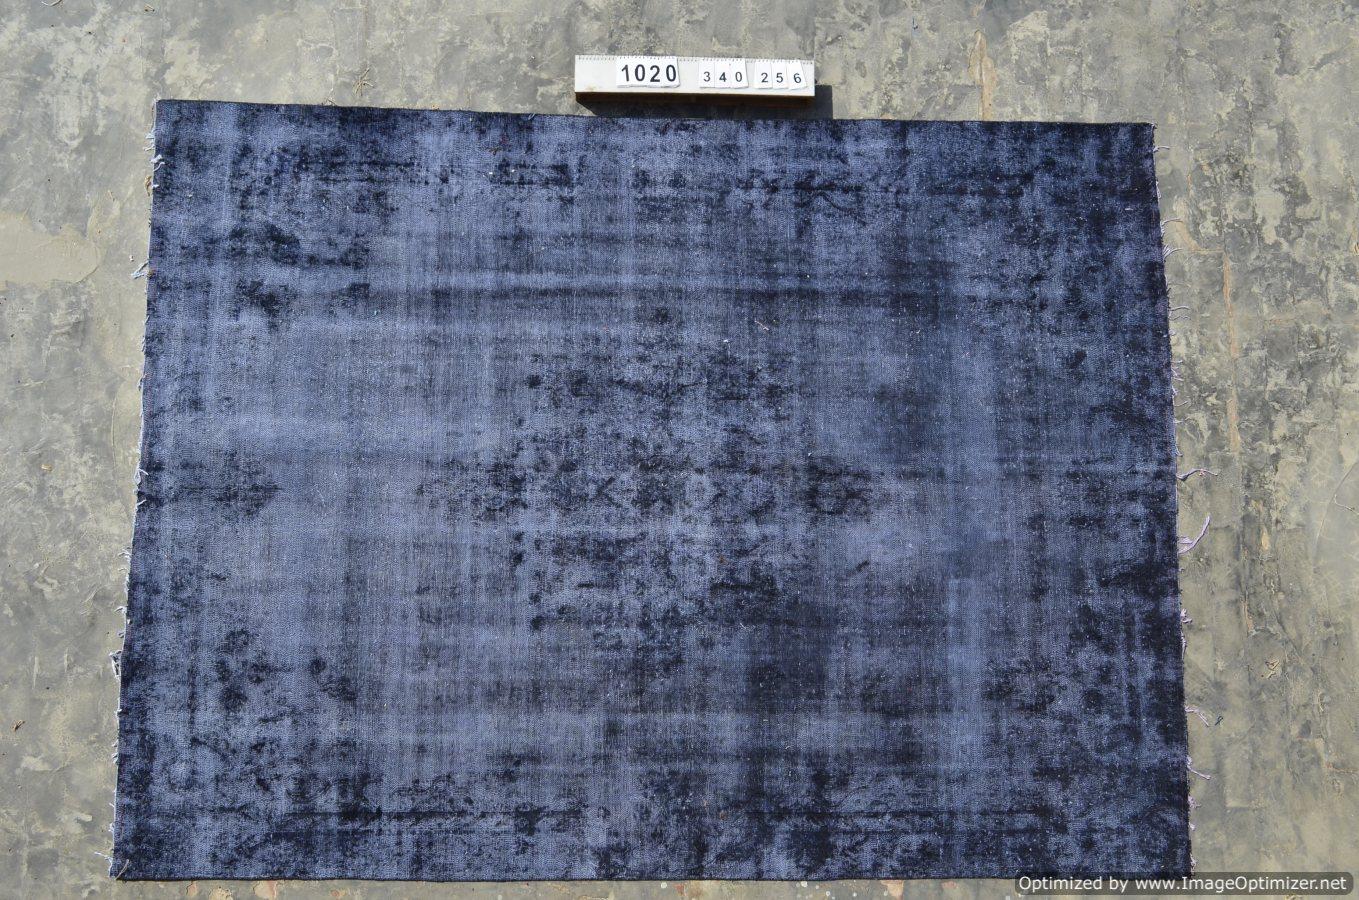 Zeer groot oud vloerkleed 1020 (340cm x 256cm) VERKOCHT